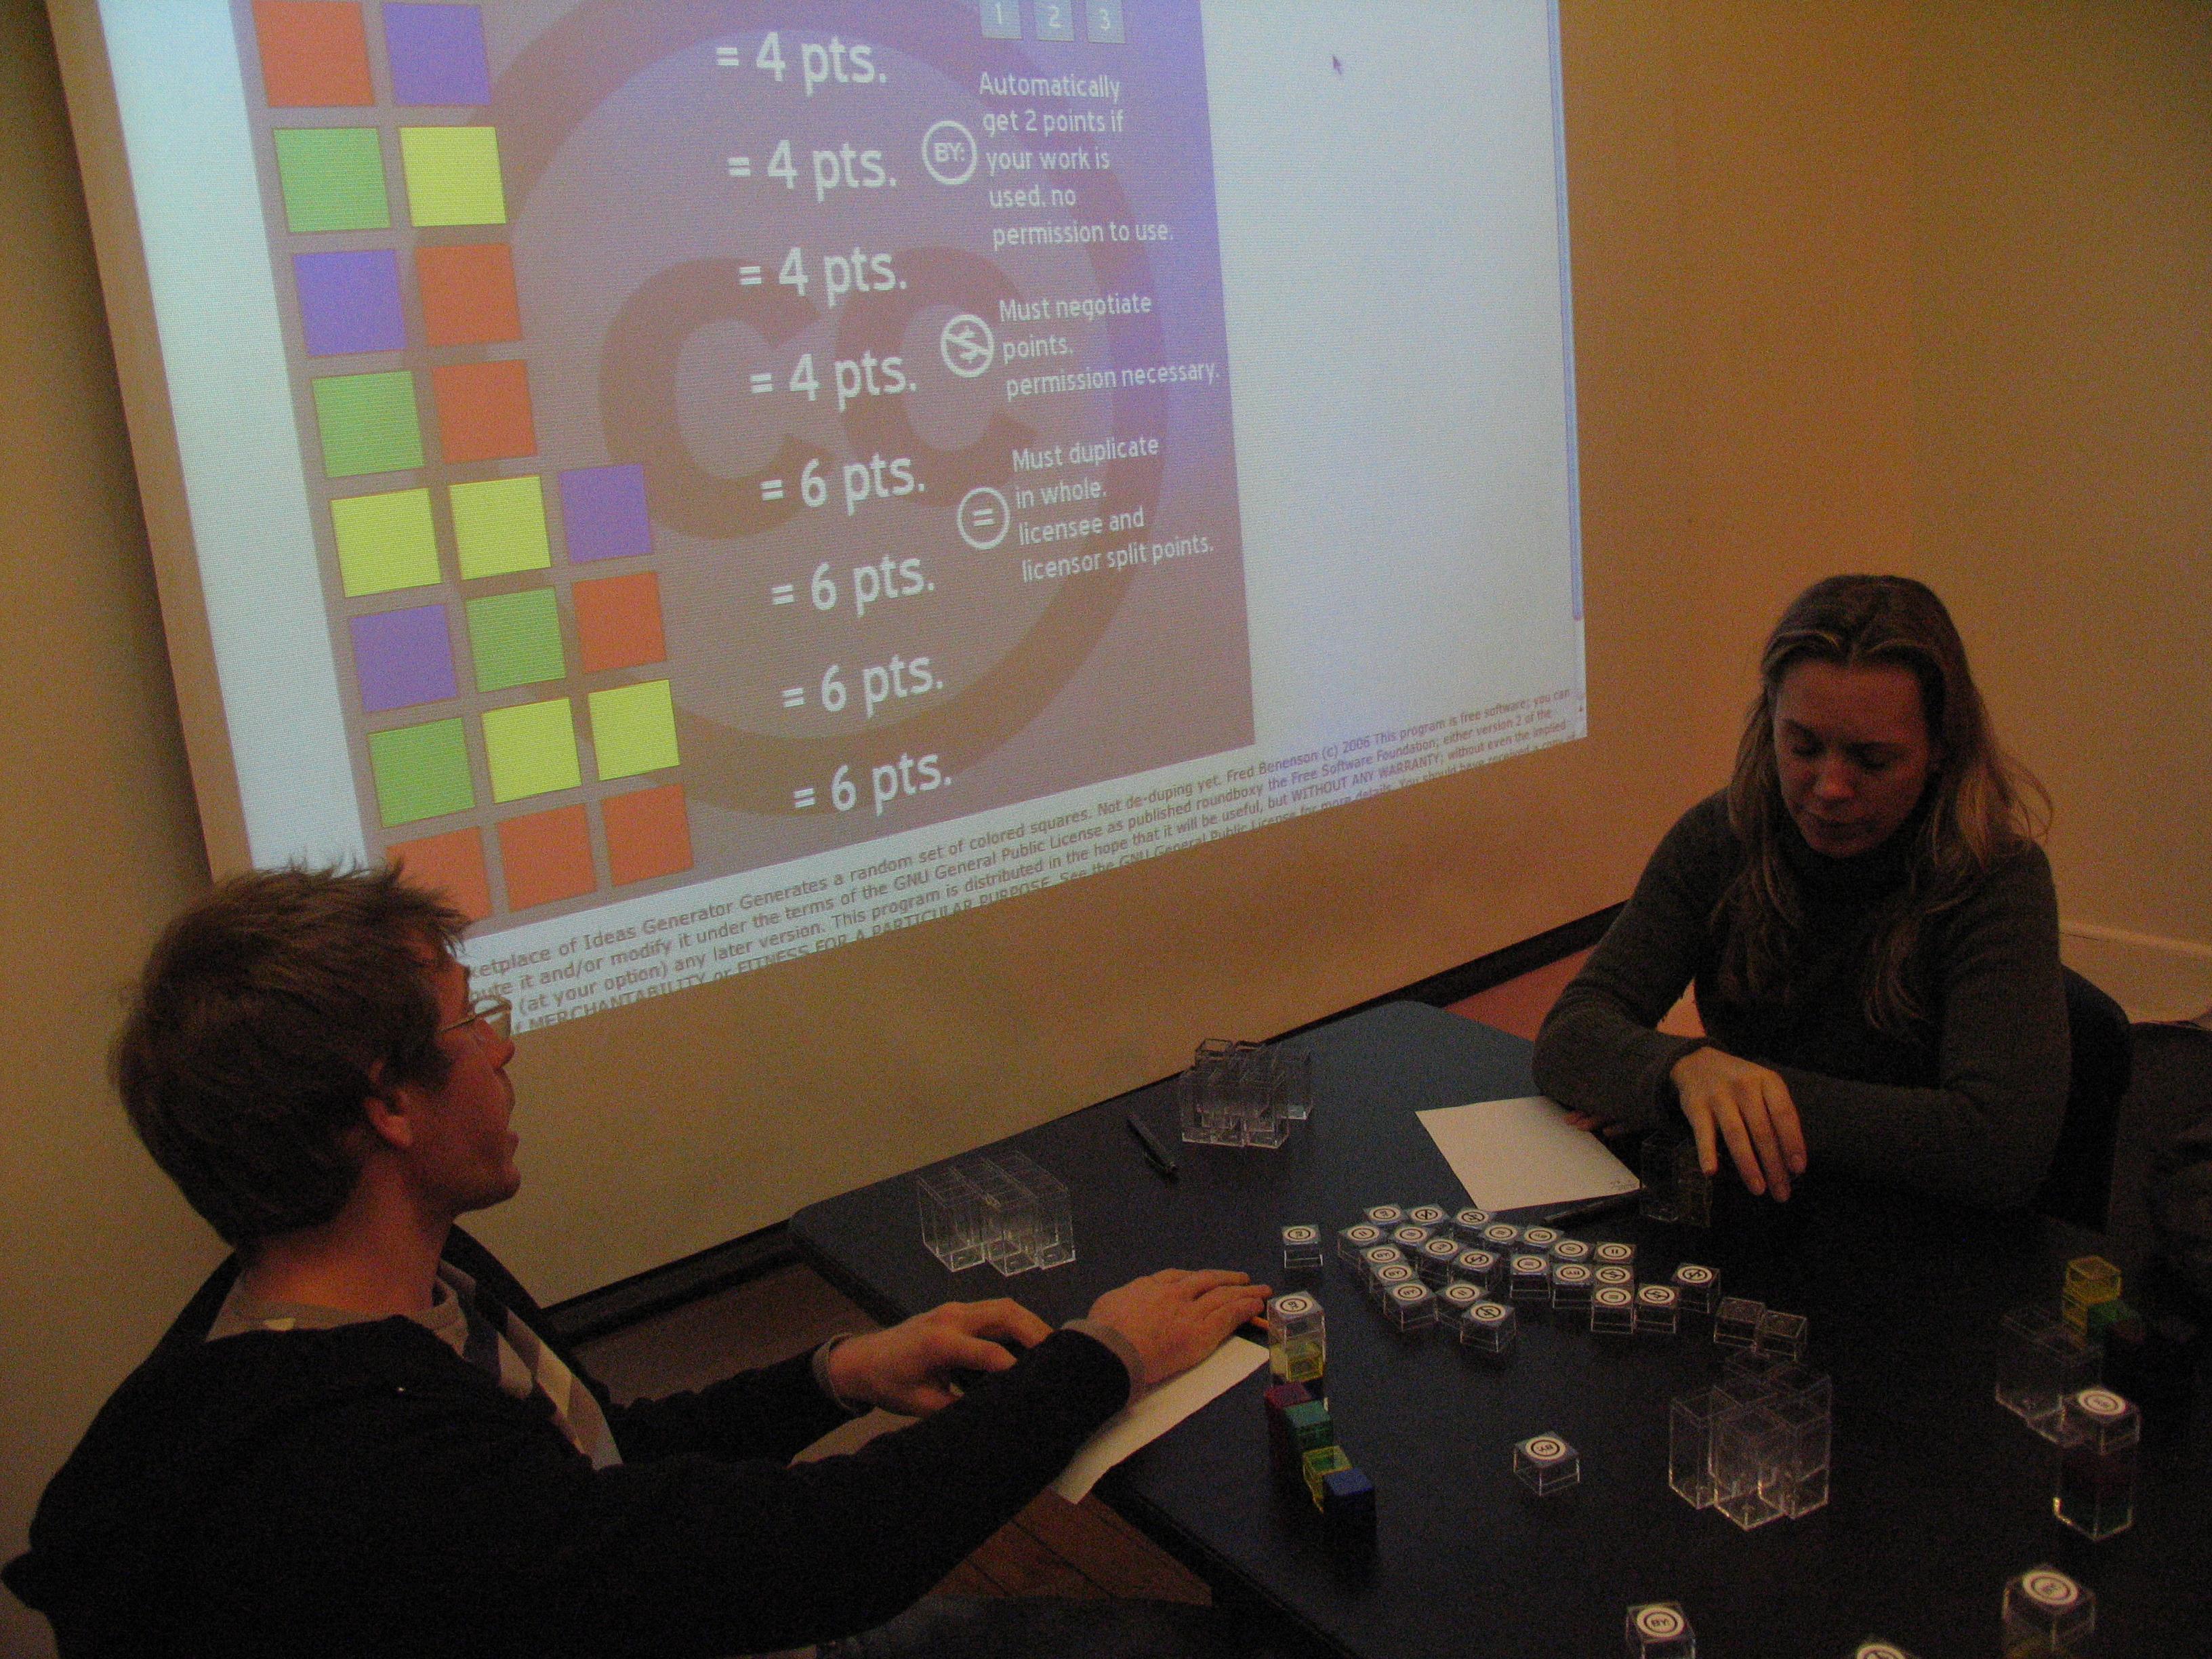 Онлайн казино азарт плей отзывы